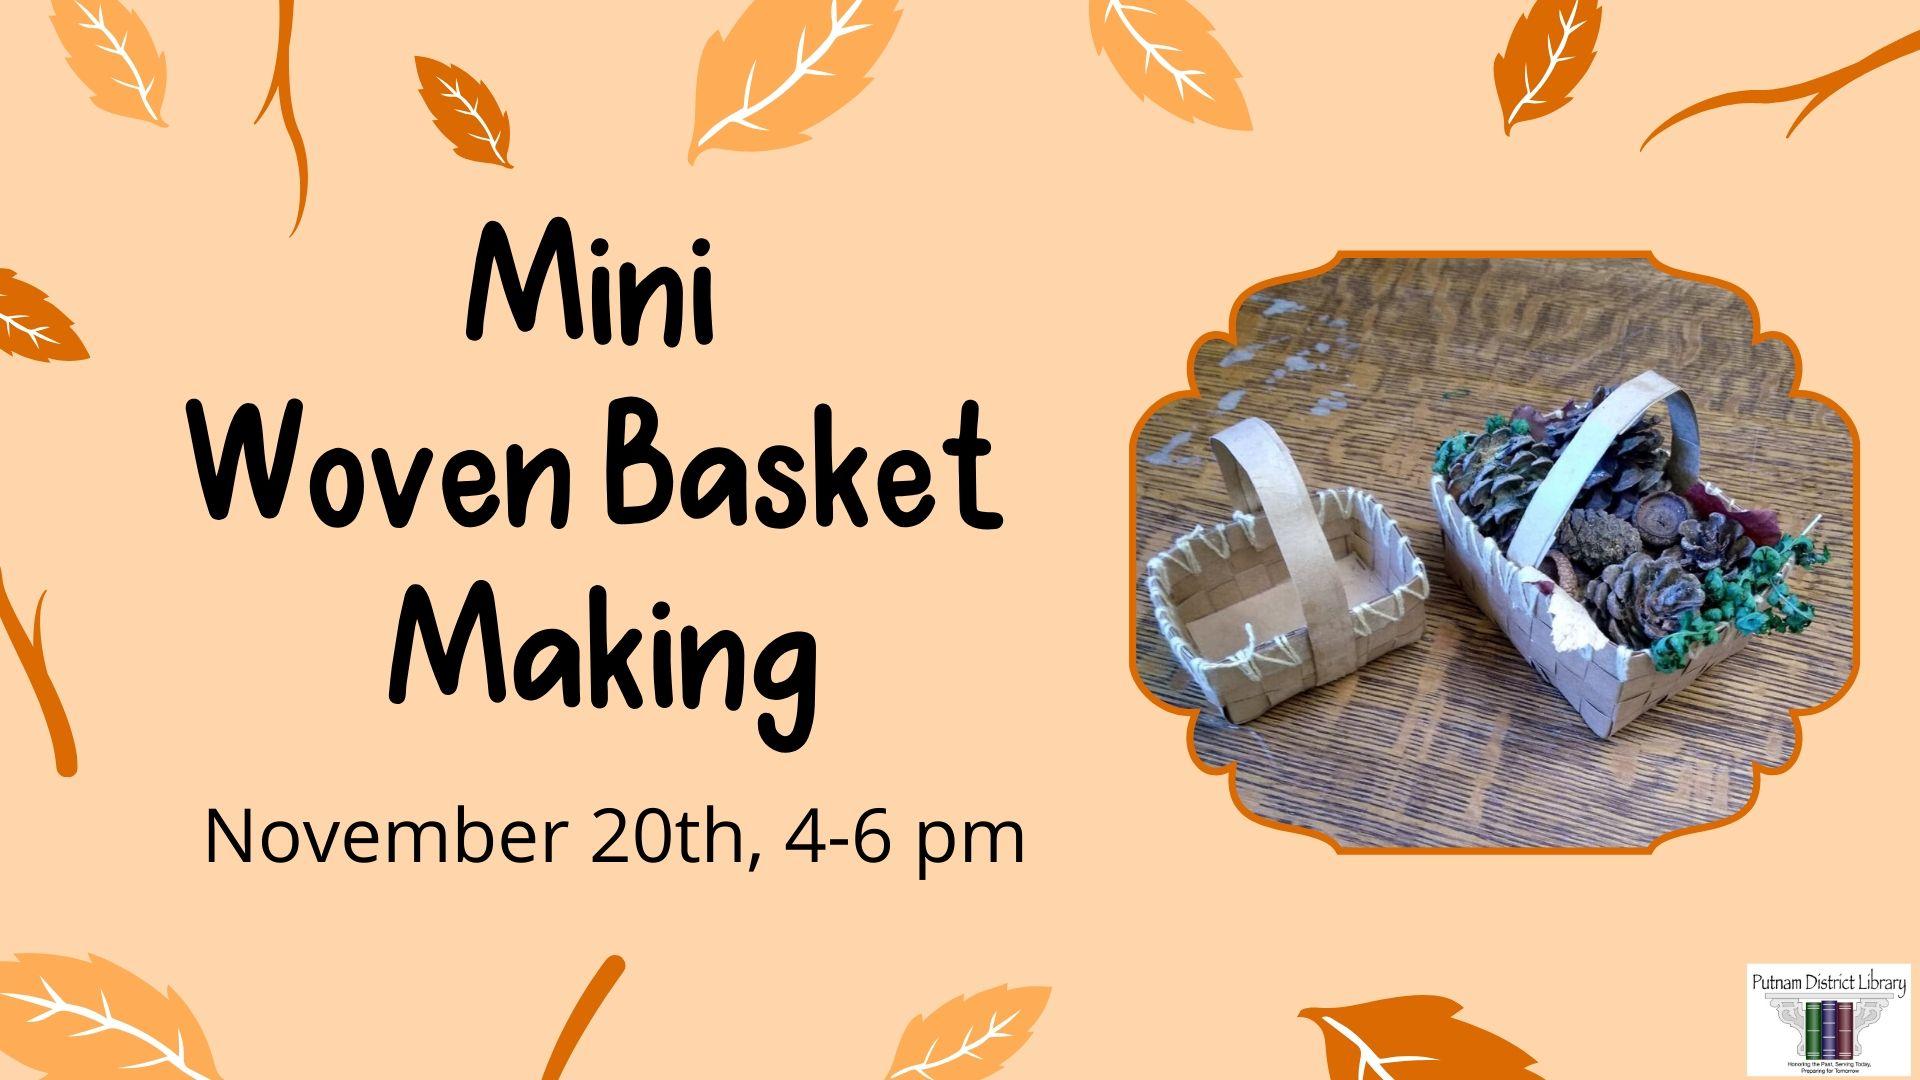 Mini Woven Basketmaking